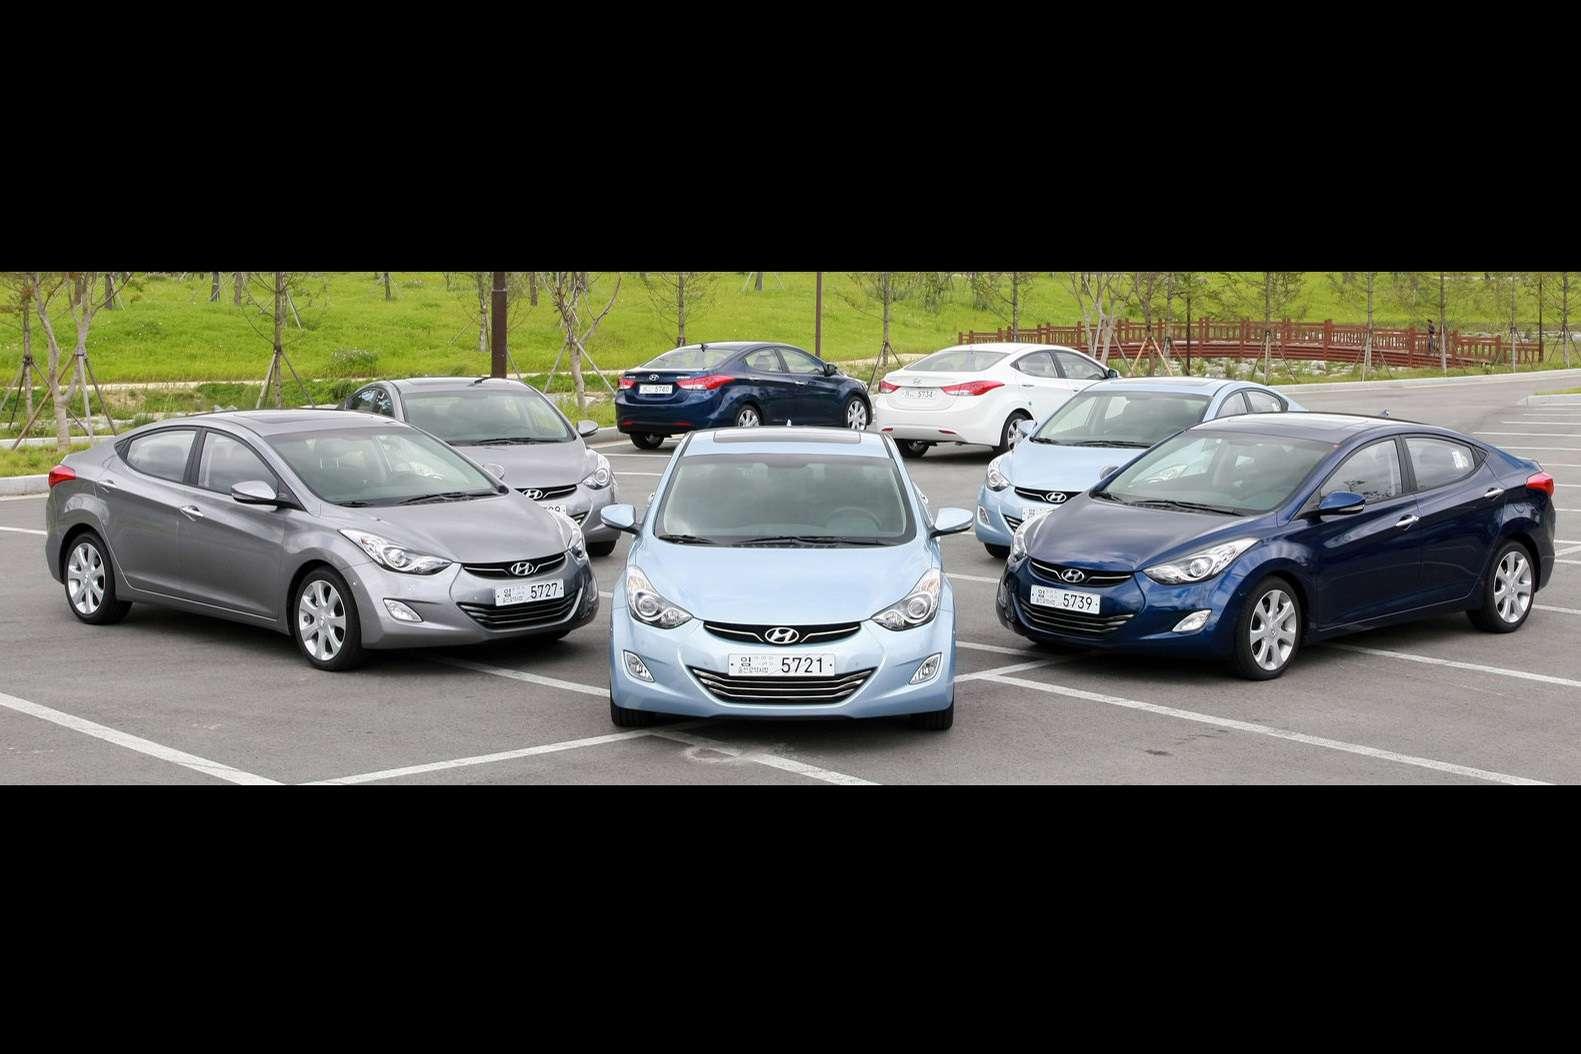 Hyundai Elantra Avante fot lipiec 2010